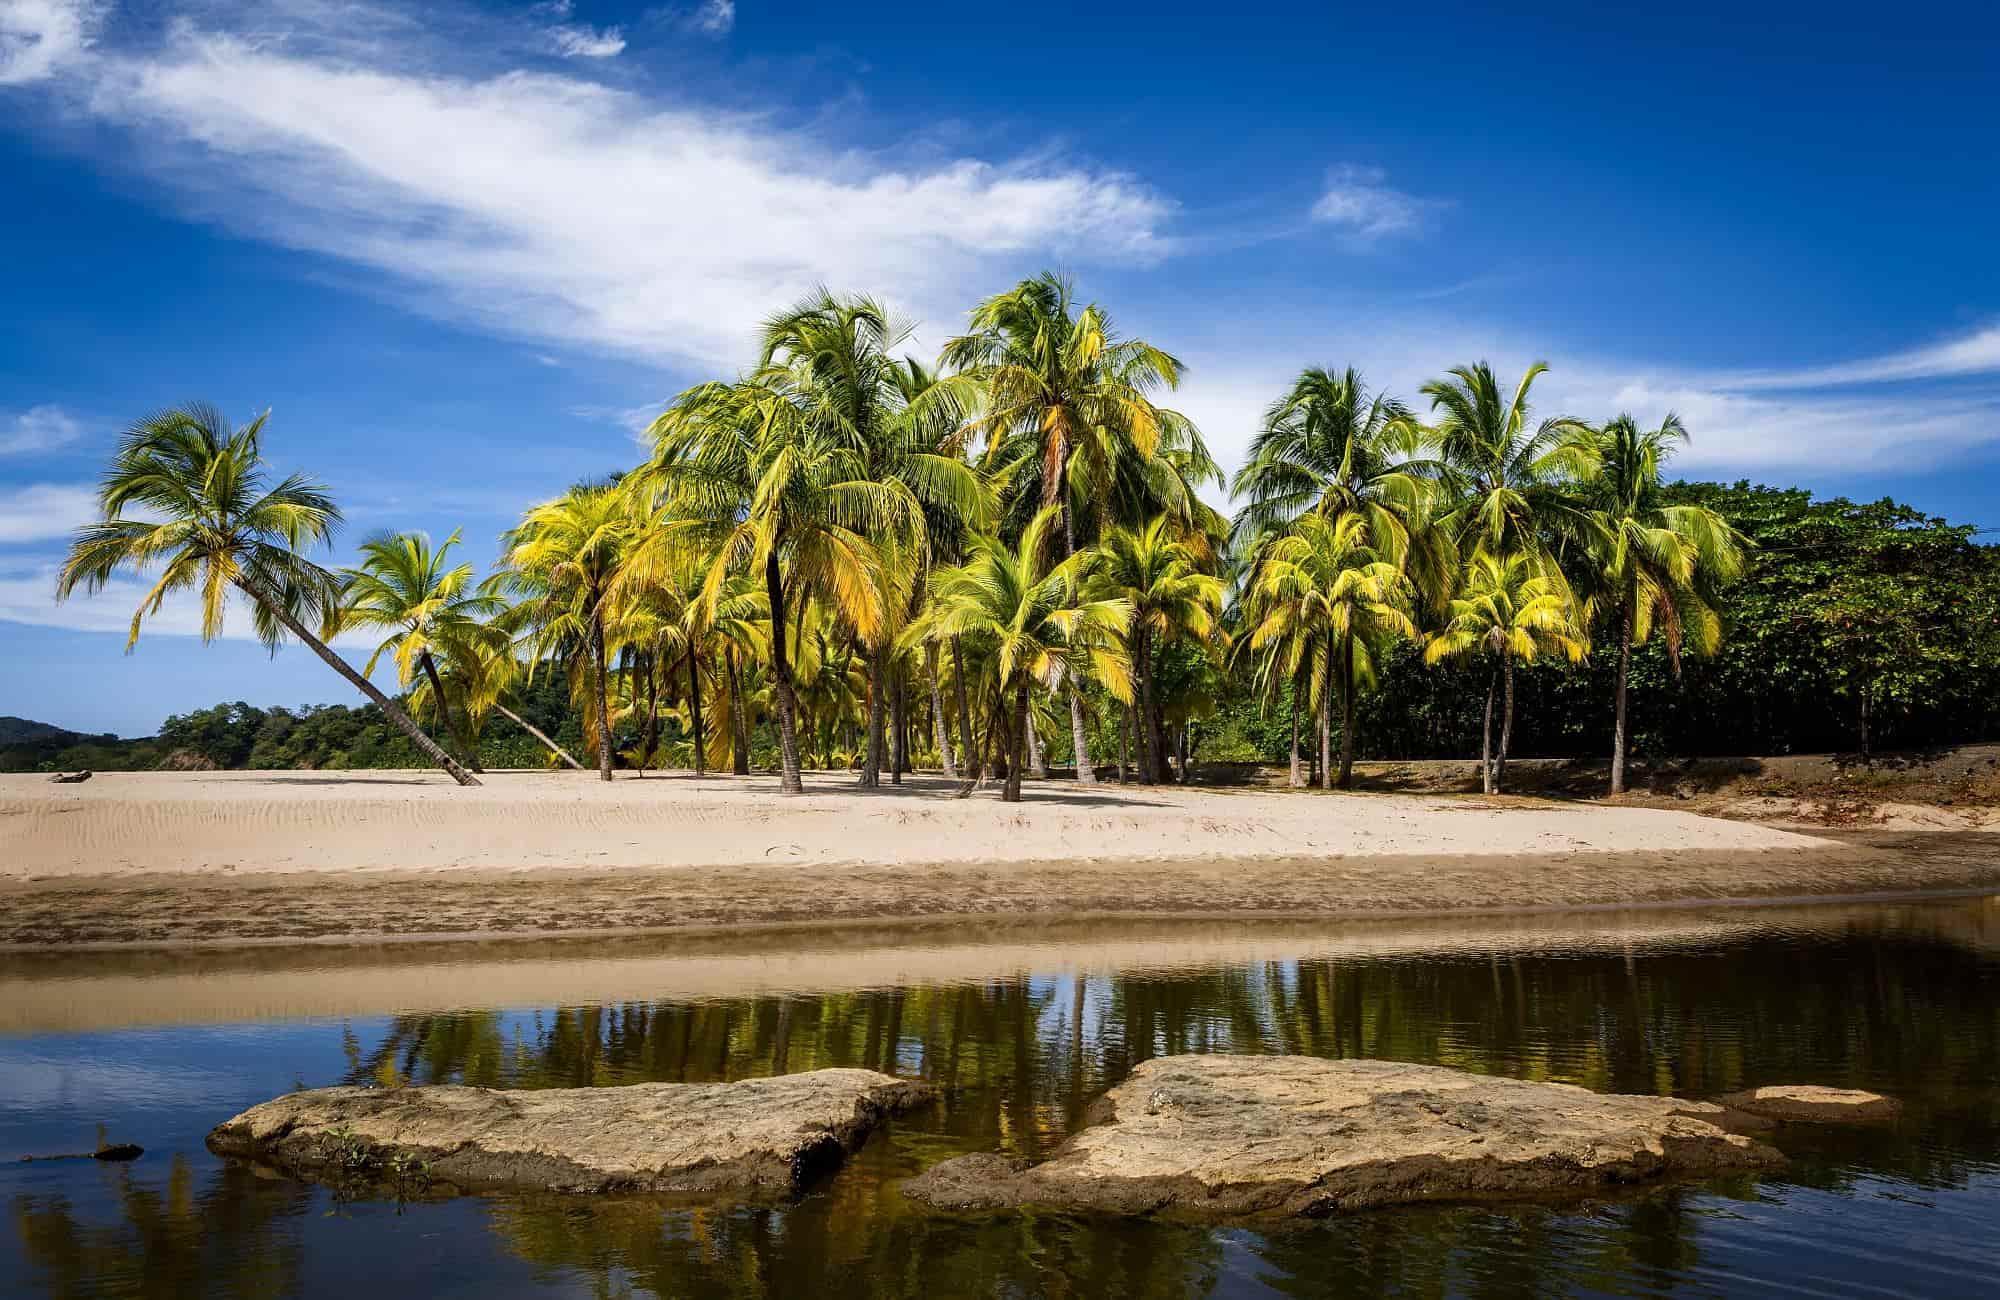 Voyage au Costa Rica - Guanacaste - Amplitudes